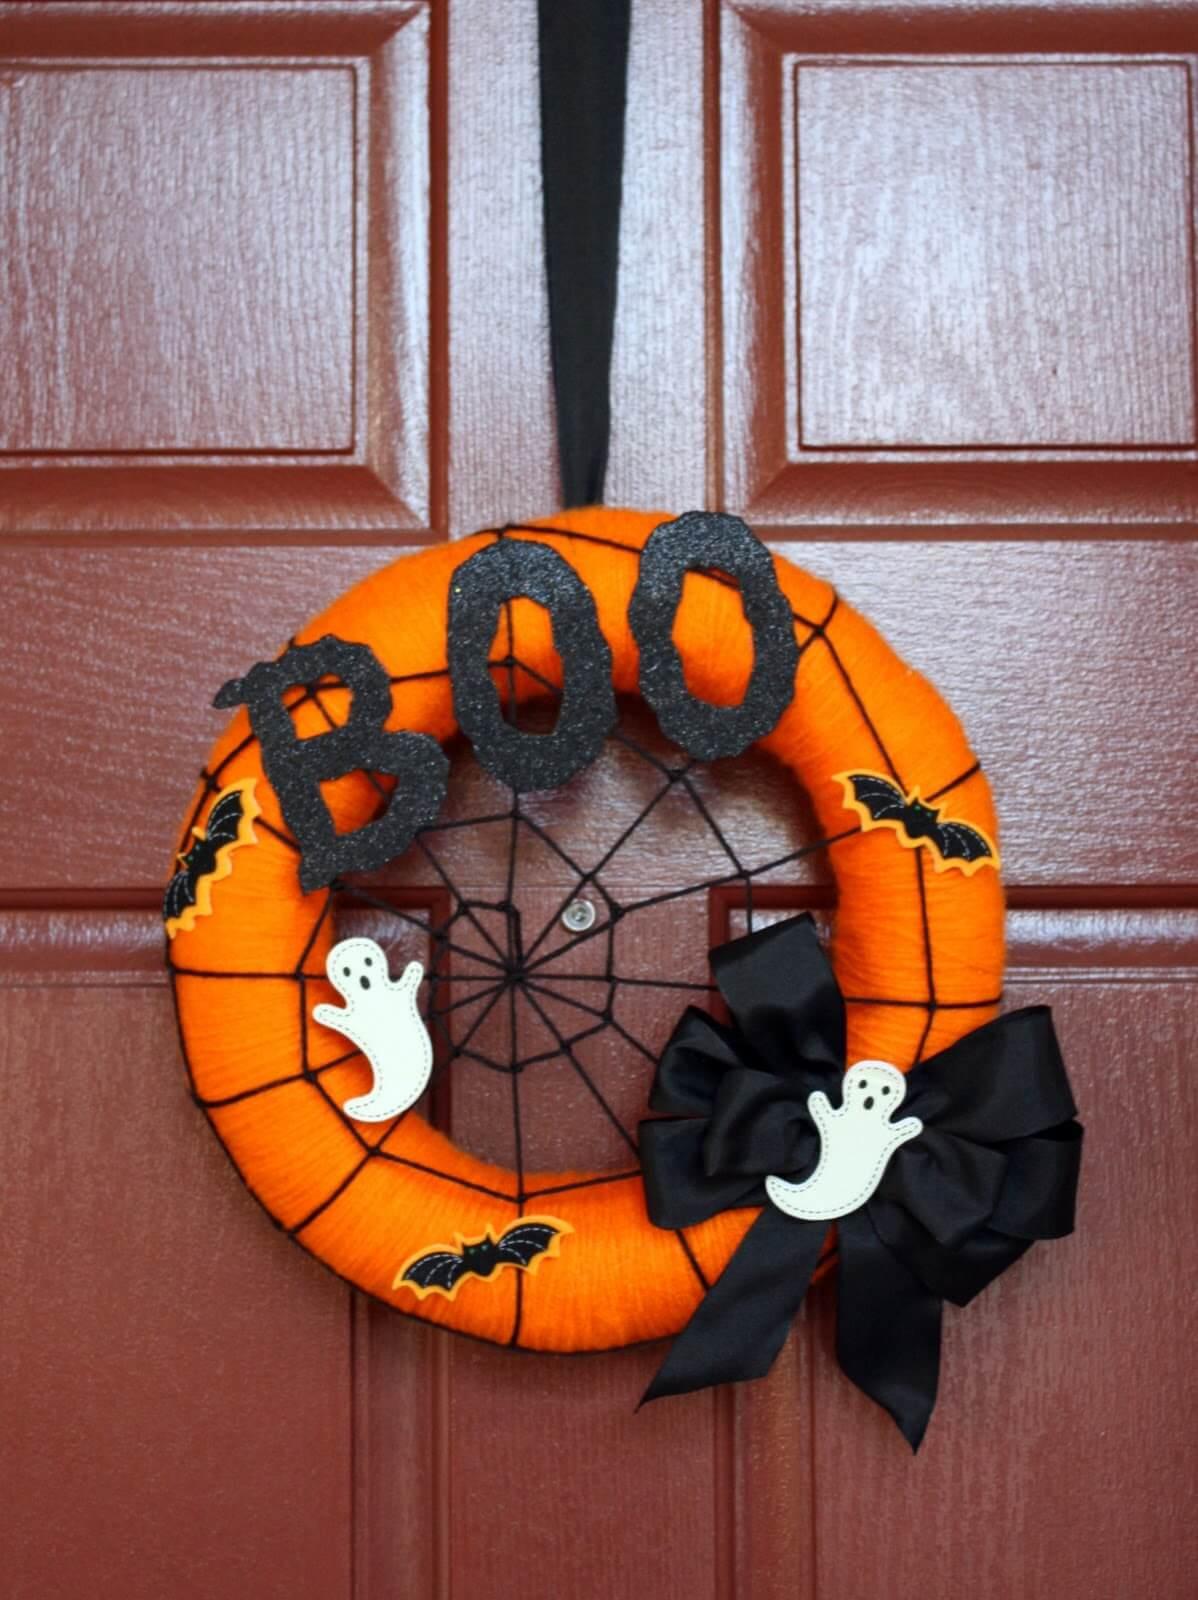 A Spooky Halloween Ghost Wreath